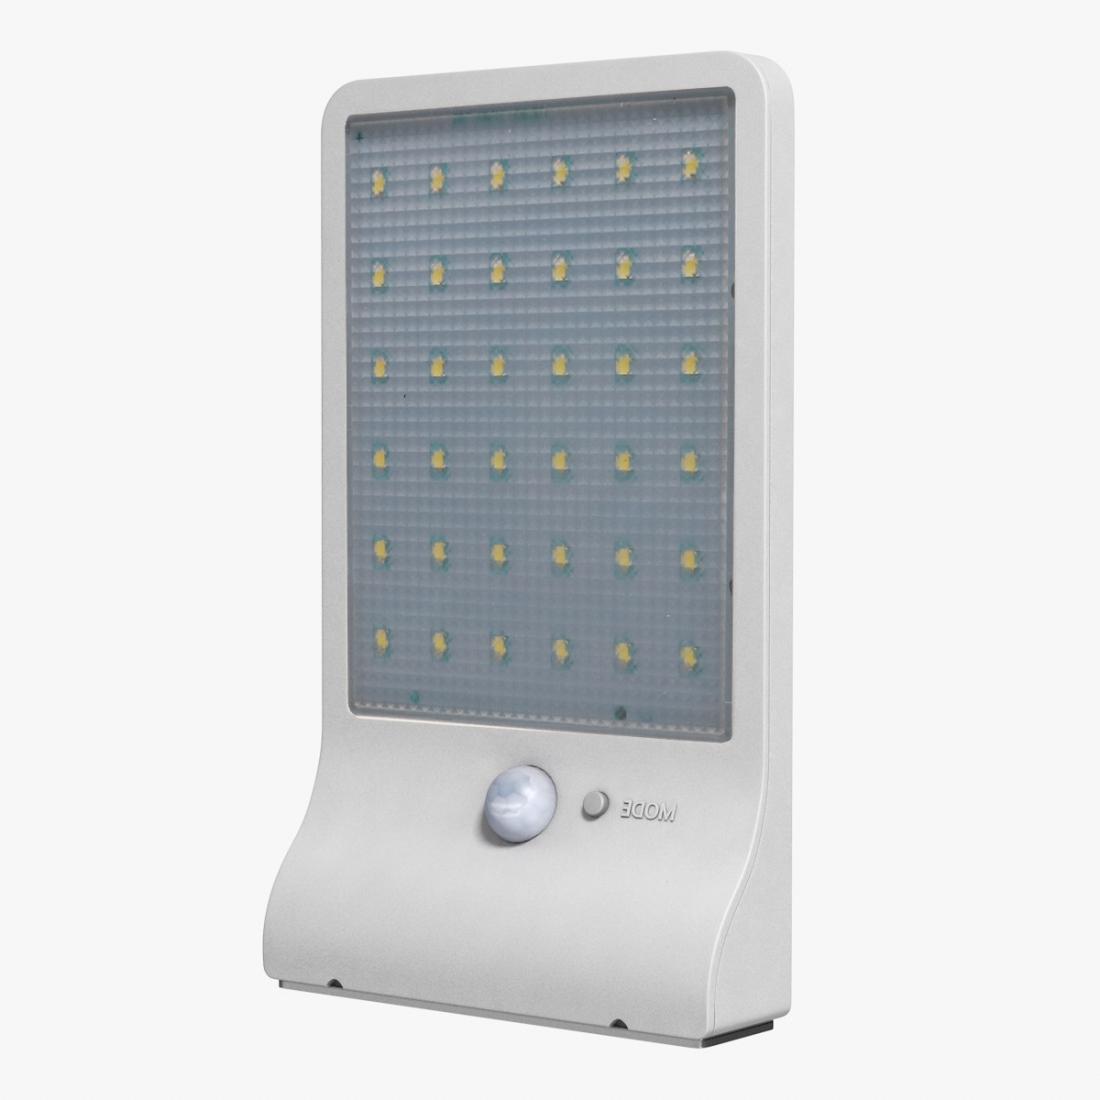 4W 36 LEDs 450 LM IP65 Waterproof Solar Powered Street Light PIR Motion Sensor Outdoor Garden Lamp (White)